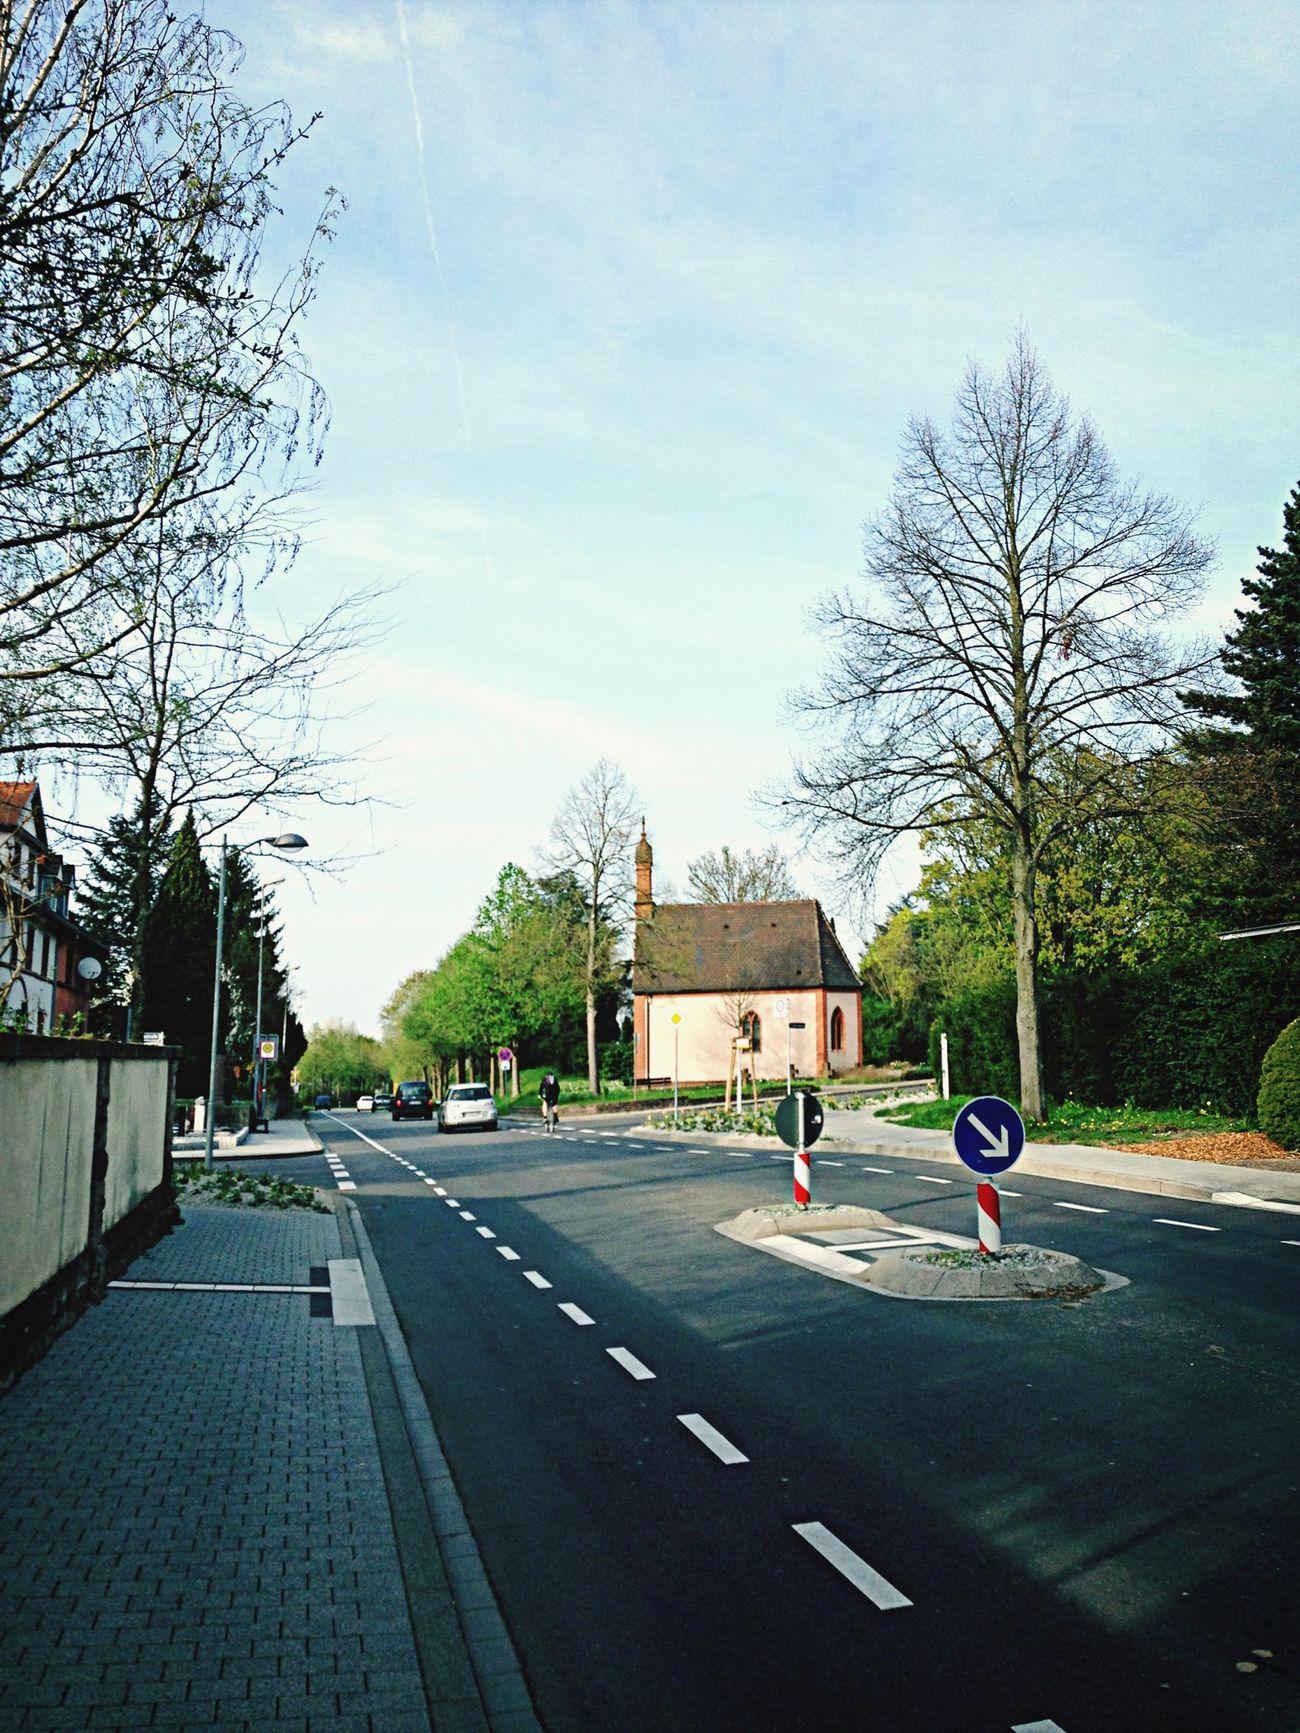 Lovely houses, clean streets. Nice neighbourhood! Roadandscenery Germany Enjoying Life Relaxing